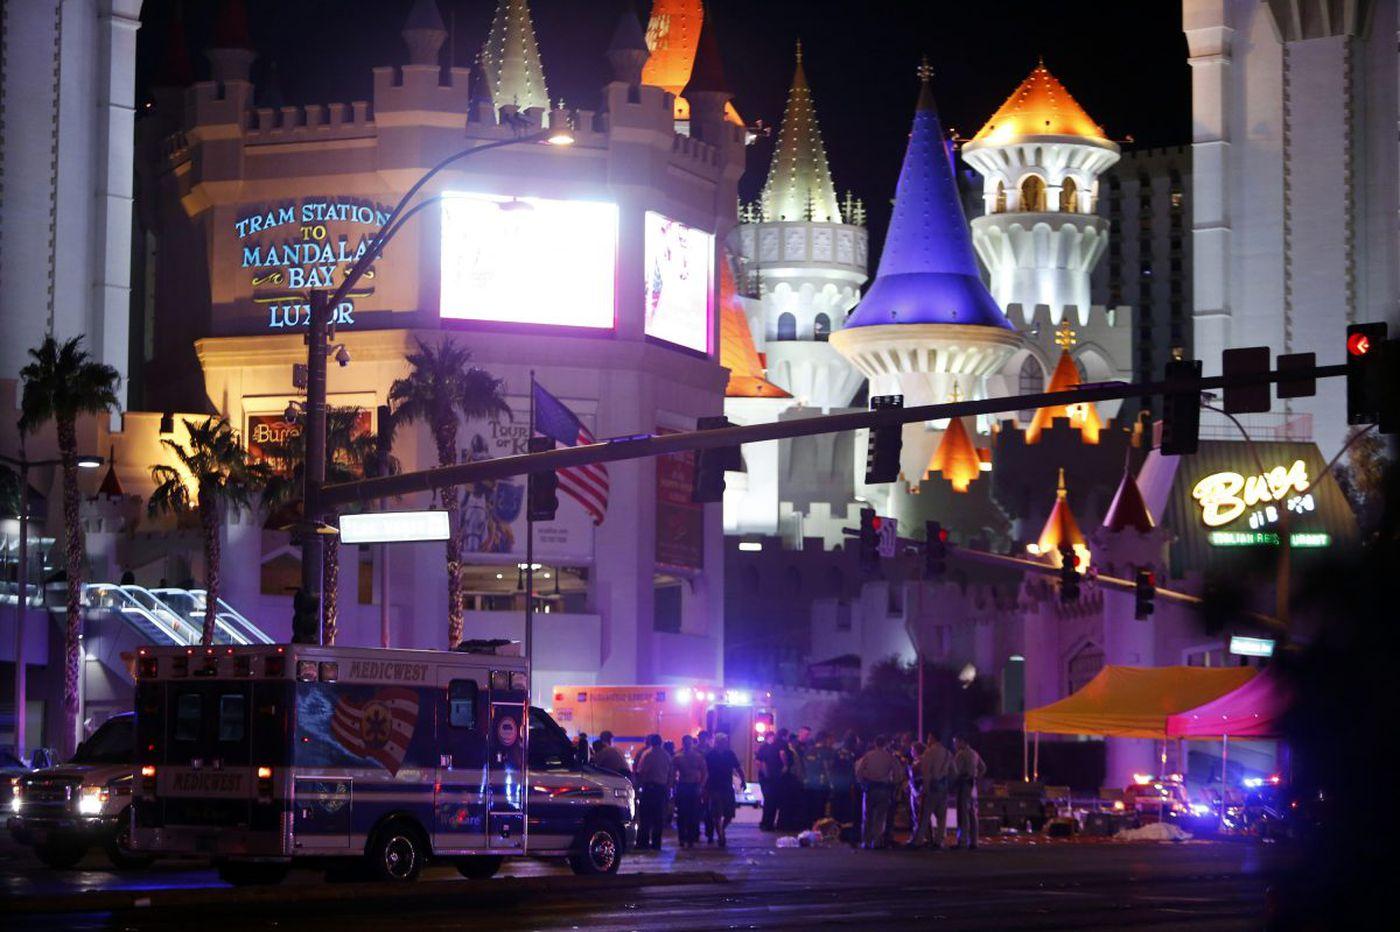 Shippensburg wrestling coach killed in Las Vegas shooting, police say